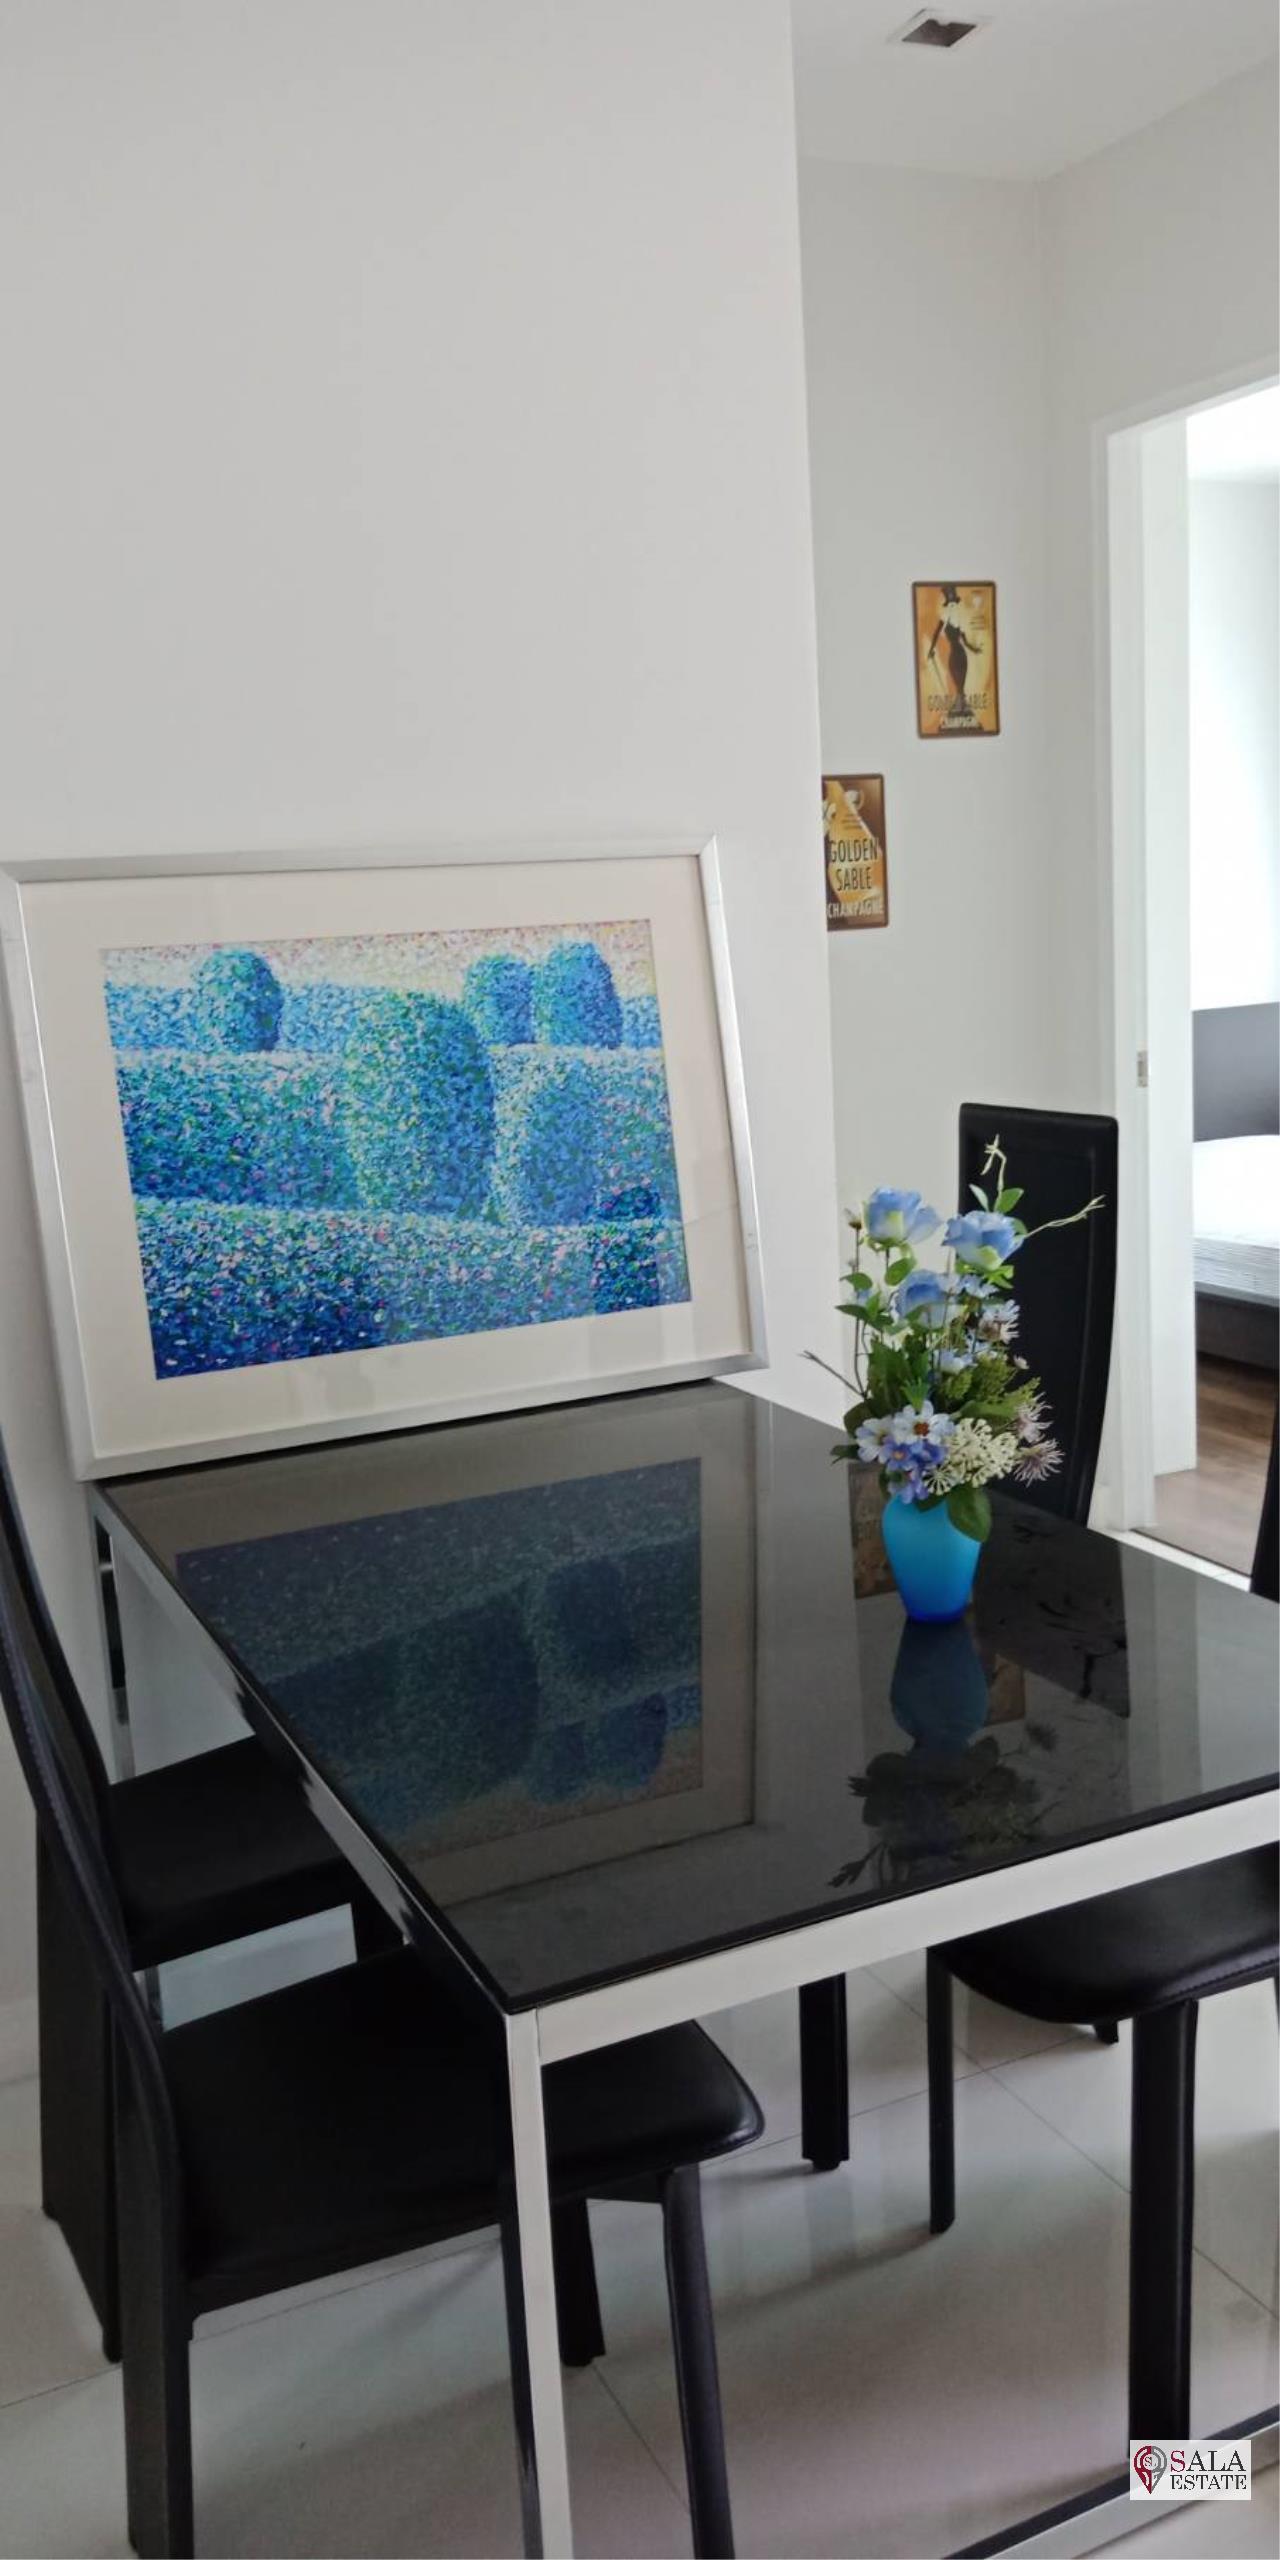 SALA ESTATE Agency's THE BLOOM SUKHUMVIT 71 – BTS PHRA KHANONG, 2 BEDROOM 1 BATHROOM, FULLY FURNISHED, CITY VIEW 4